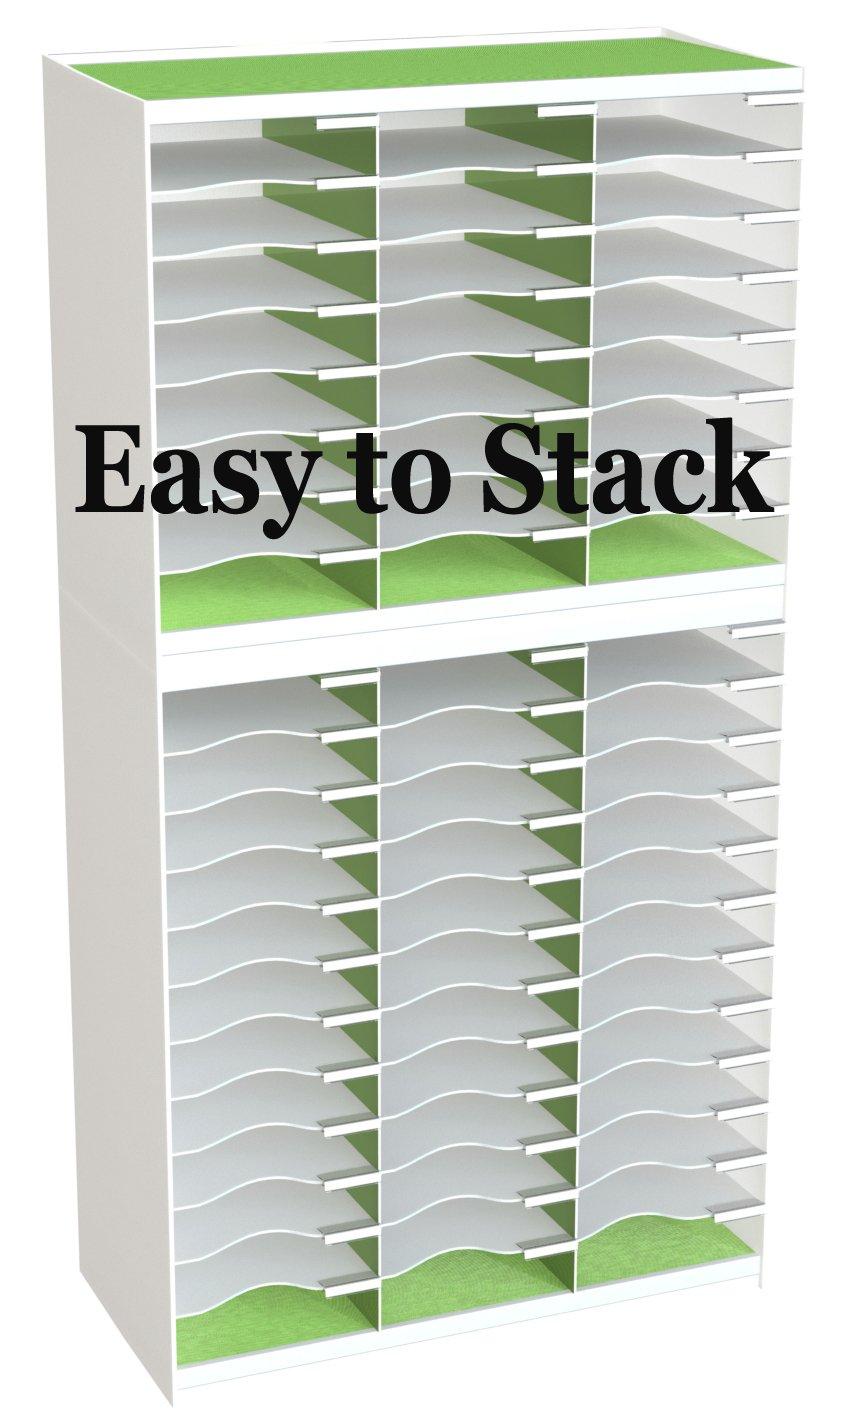 Paperflow Master Literature Organizer, 36 Compartment, White/Green (803.13.08)